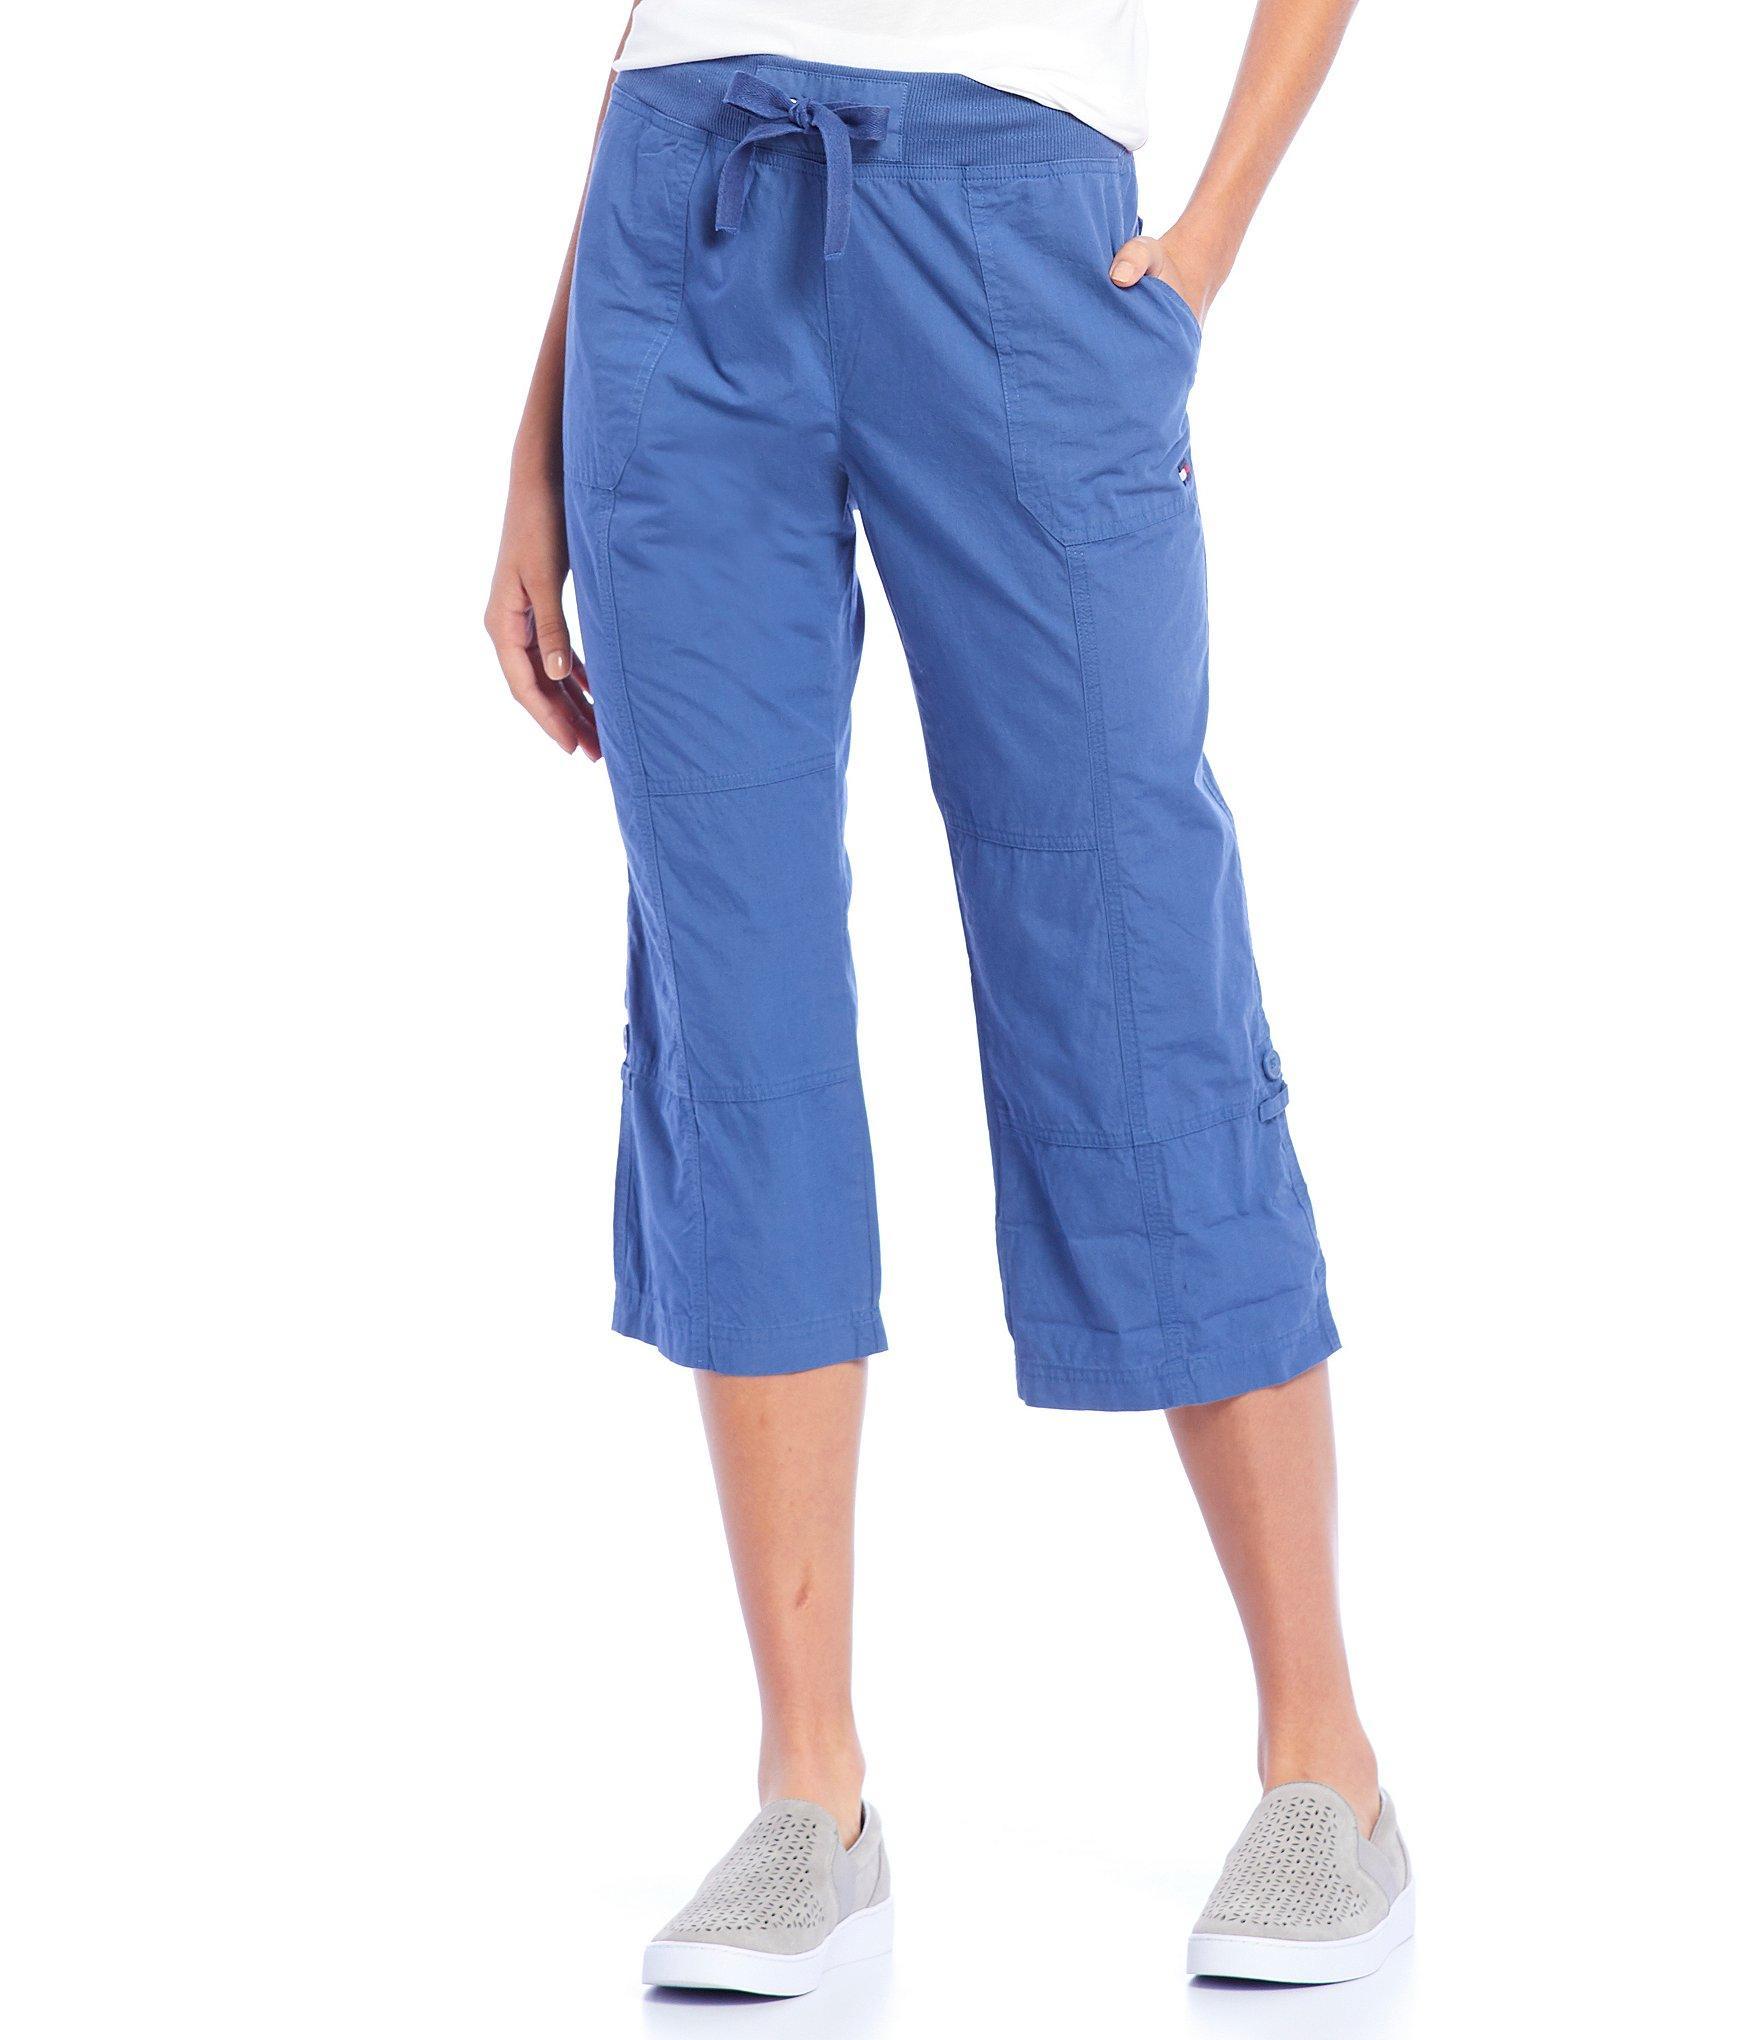 08077056b1 Lyst - Tommy Hilfiger Sport Convertible Length Capri Pants in Blue